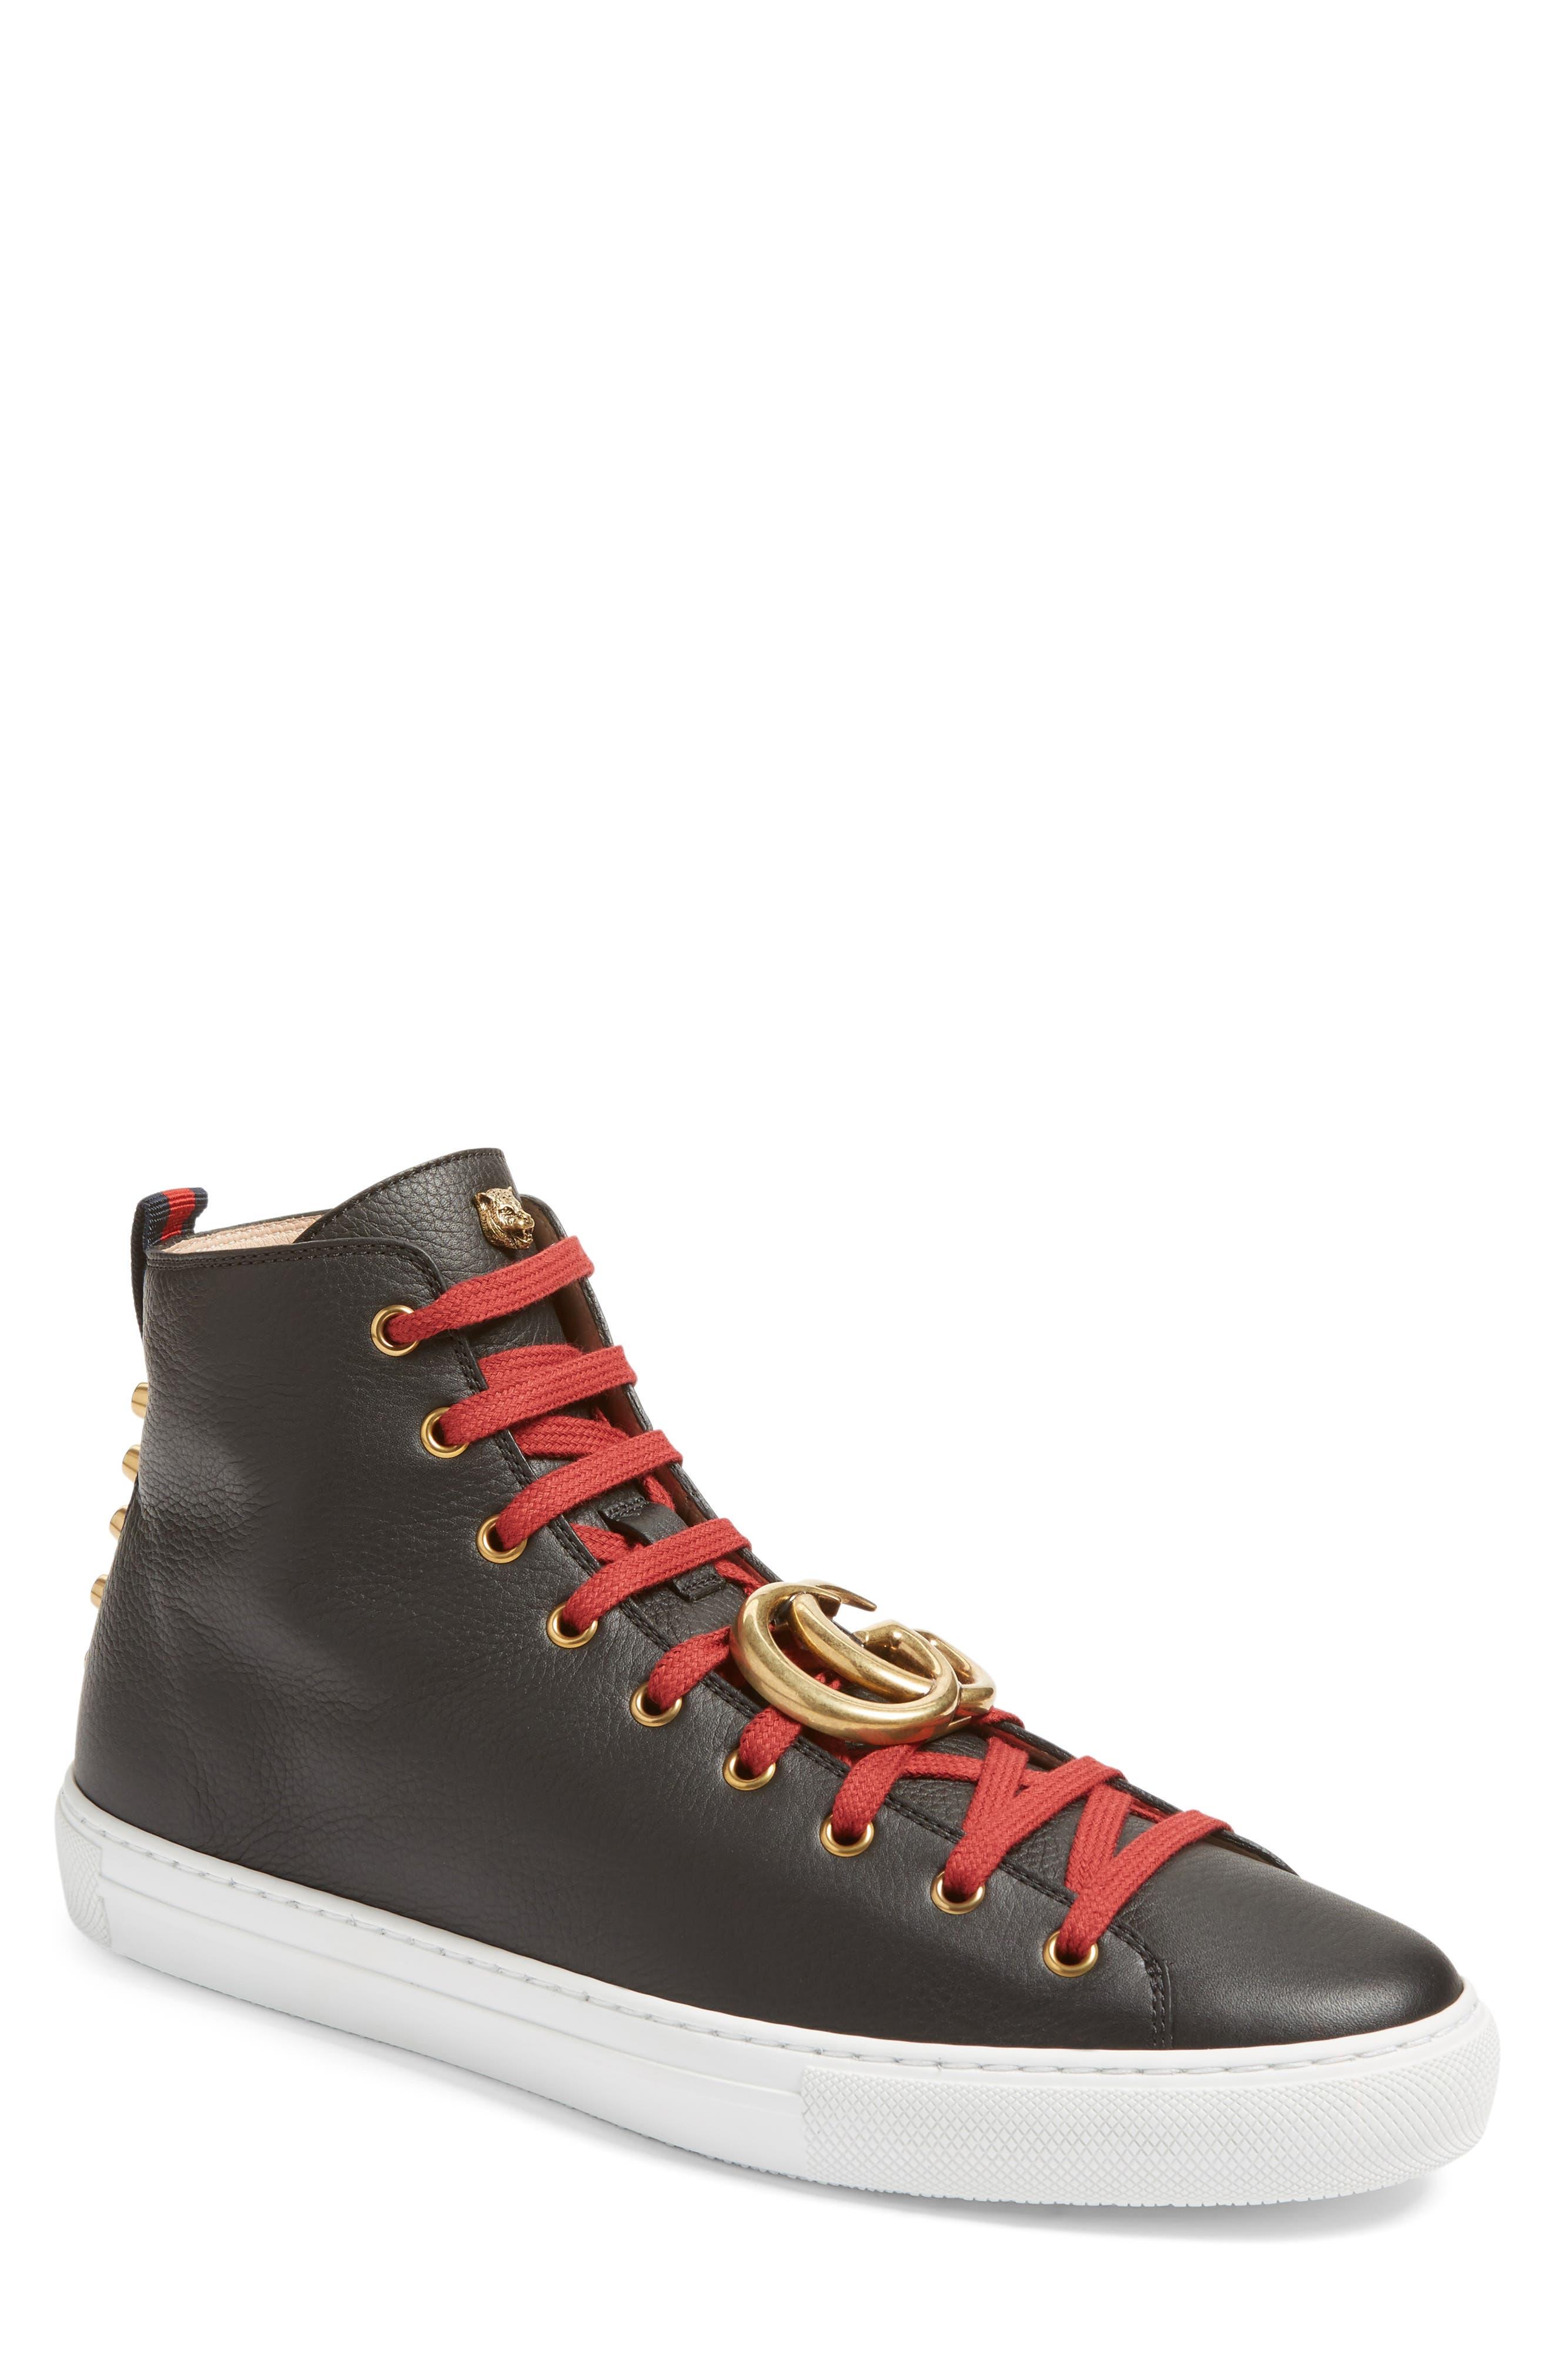 Major High Top Sneaker,                             Main thumbnail 1, color,                             007